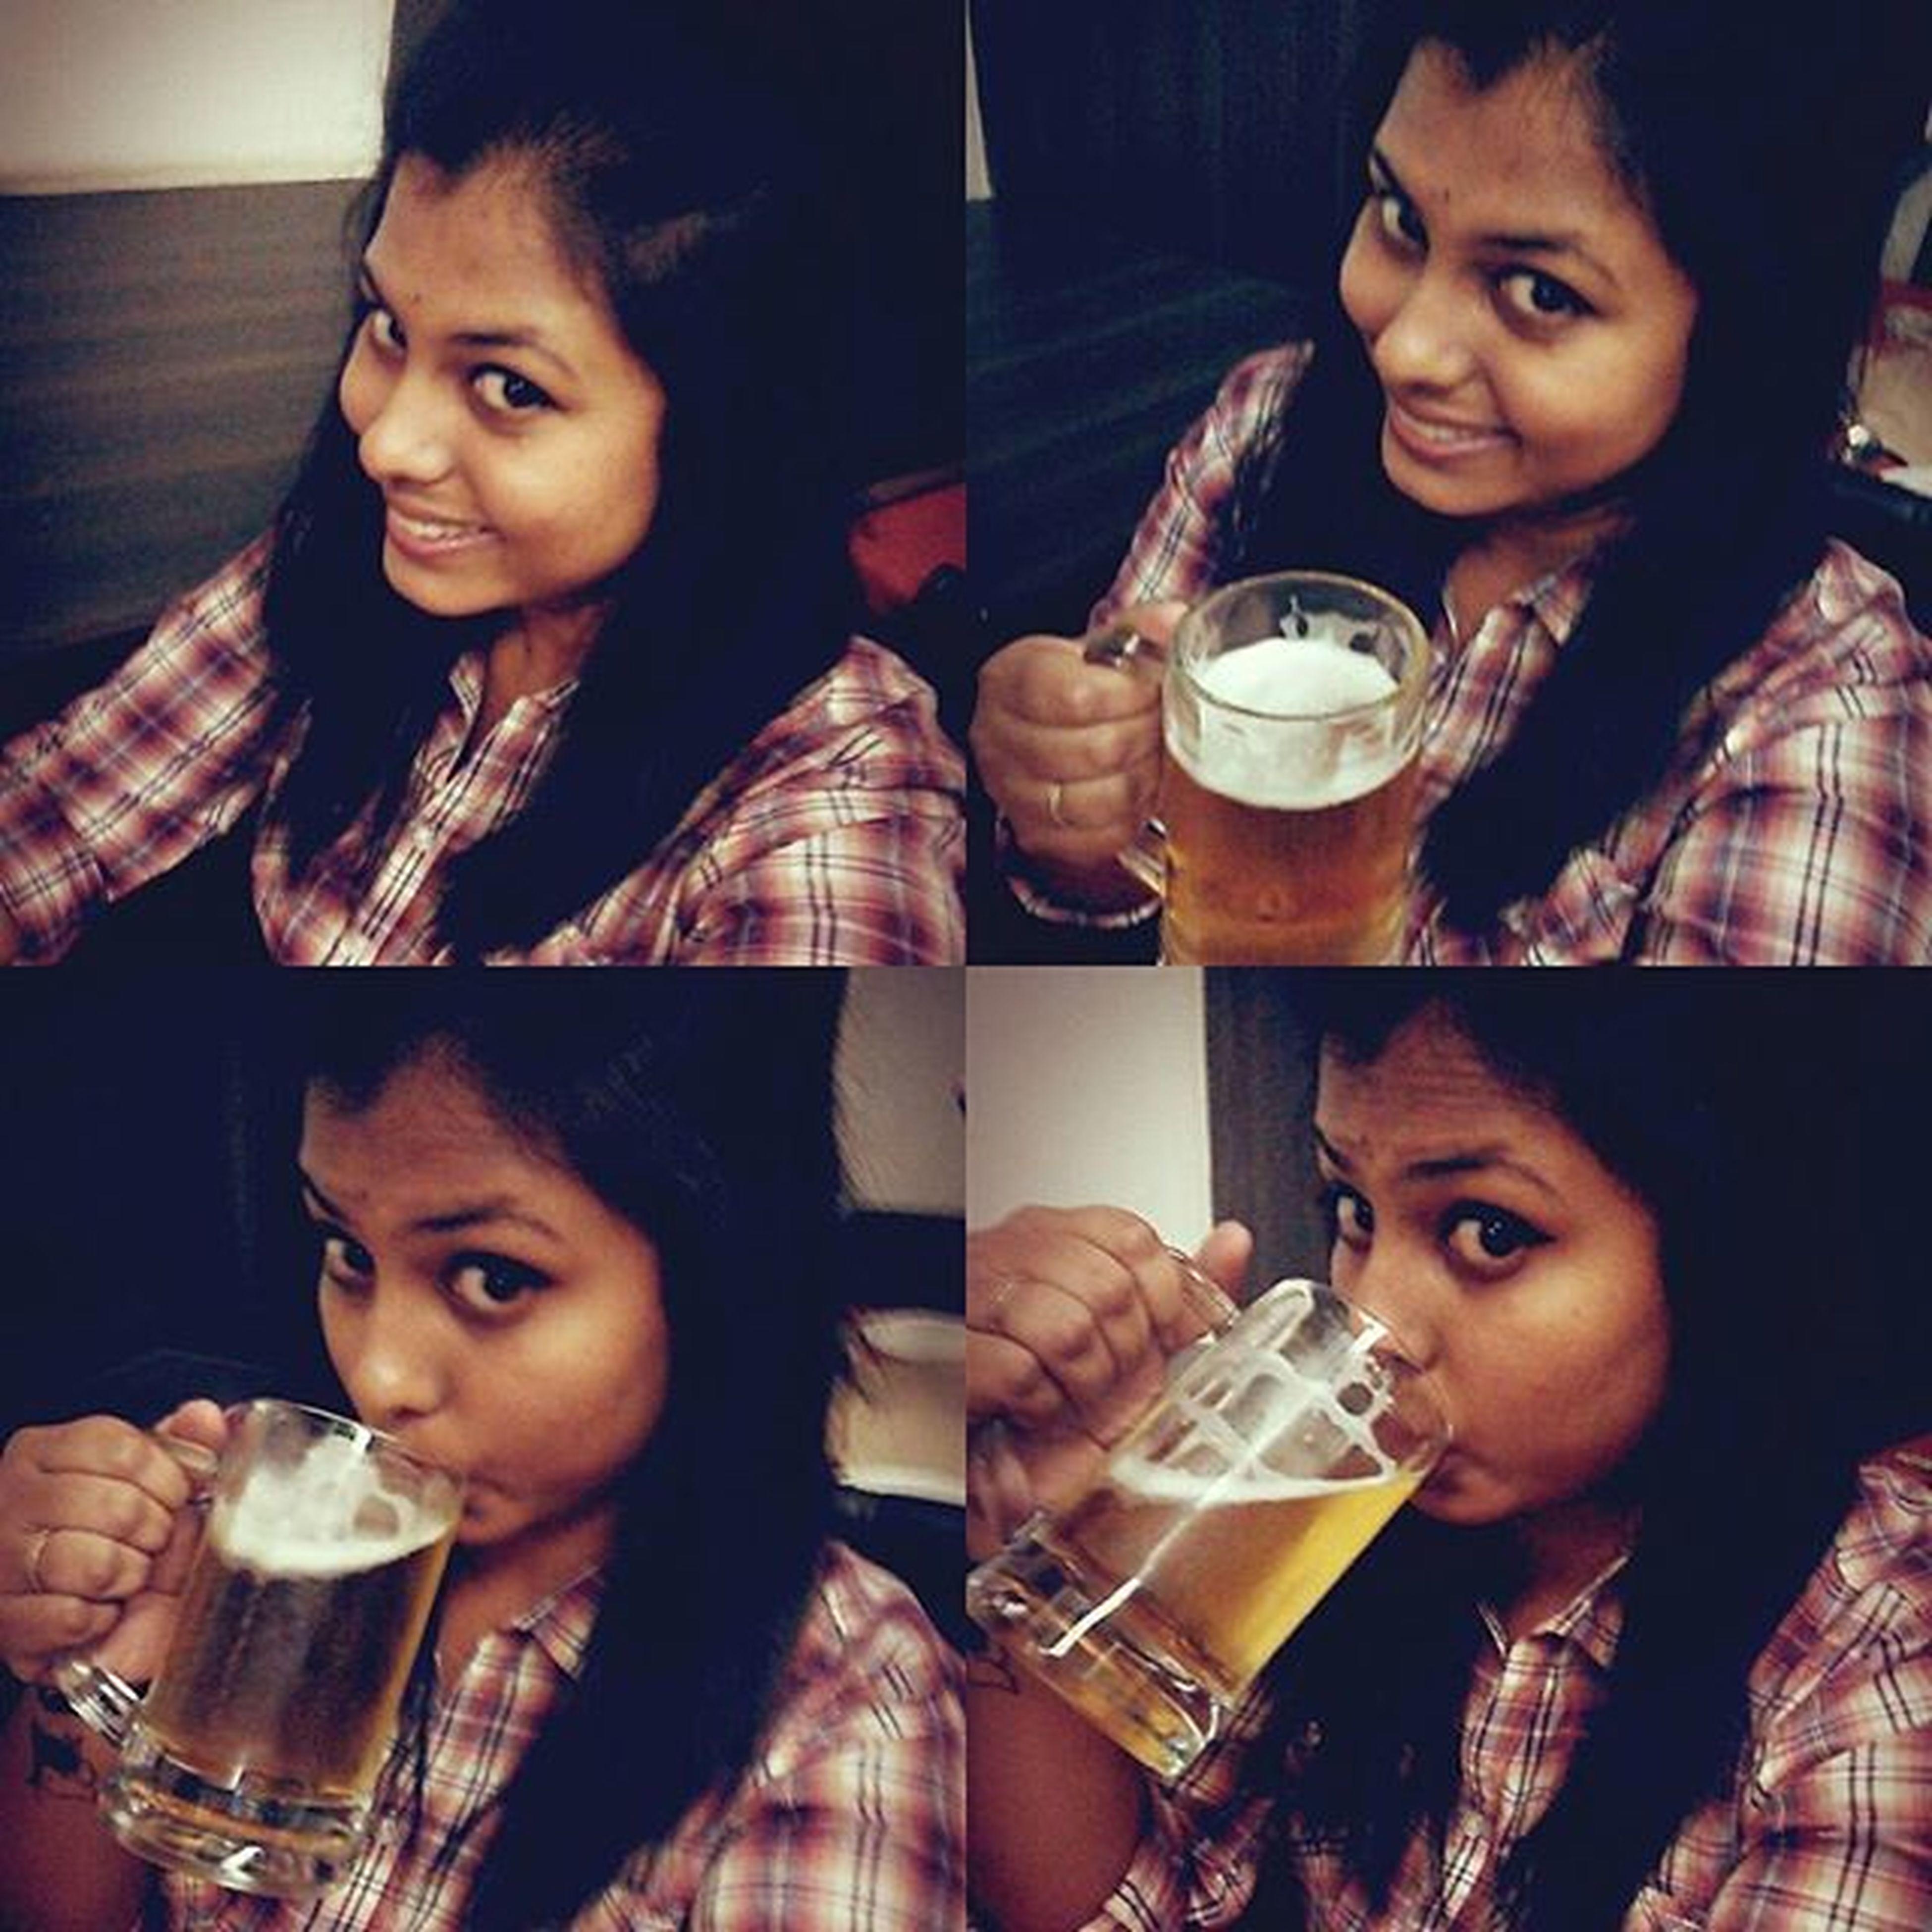 High on beer...High Beeroverloaded